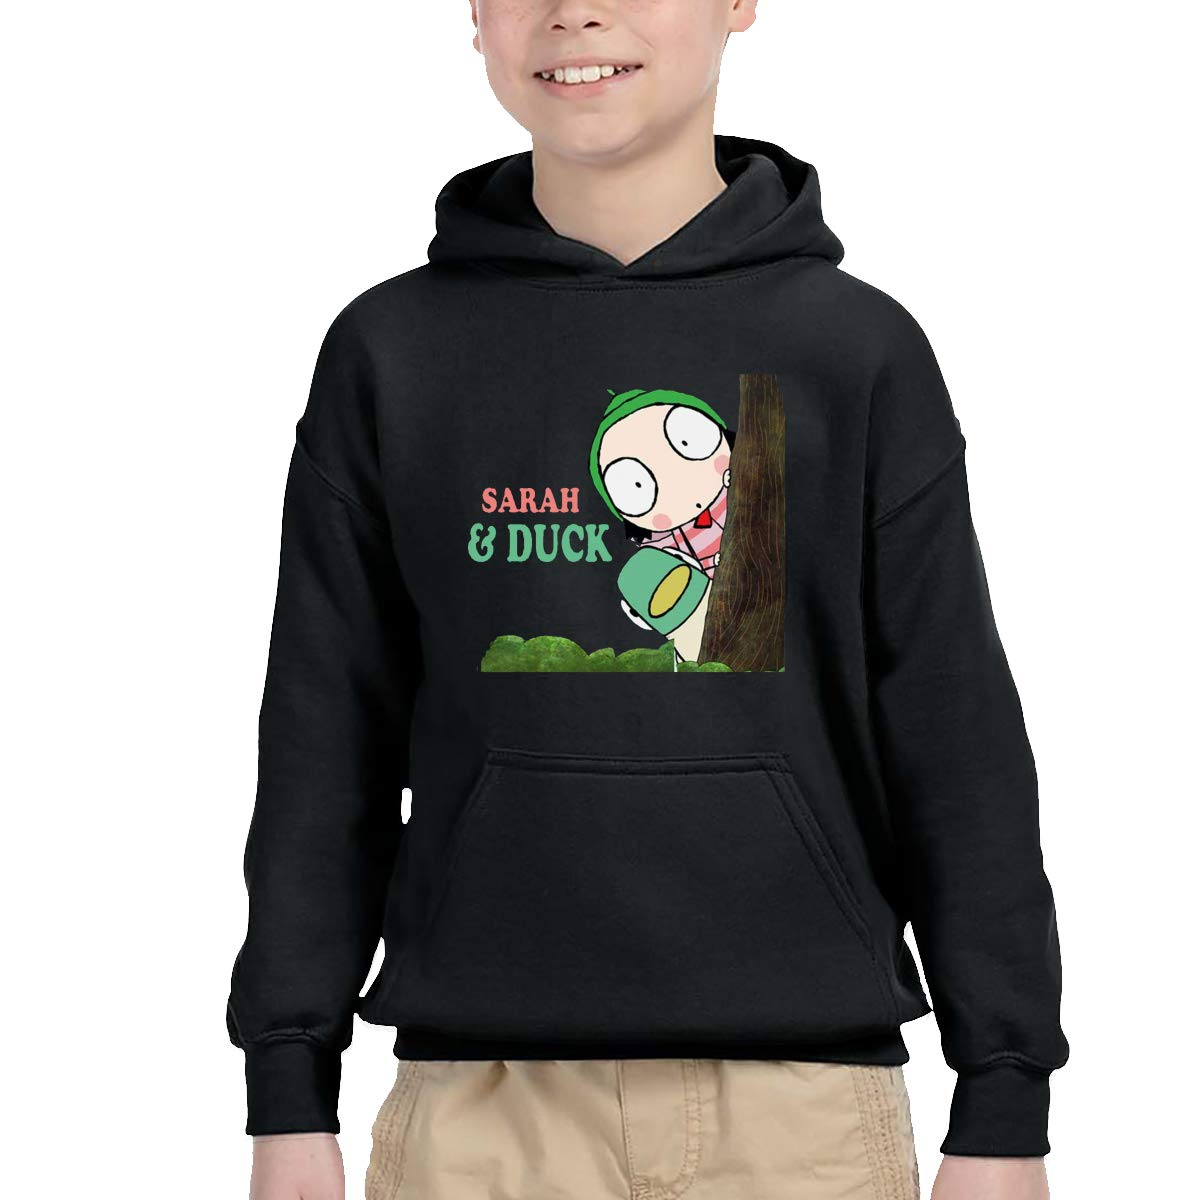 2-6 Year Old Childrens Hooded Pocket Sweater Original Retro Literary Design Sarah /& Duck Logo Black